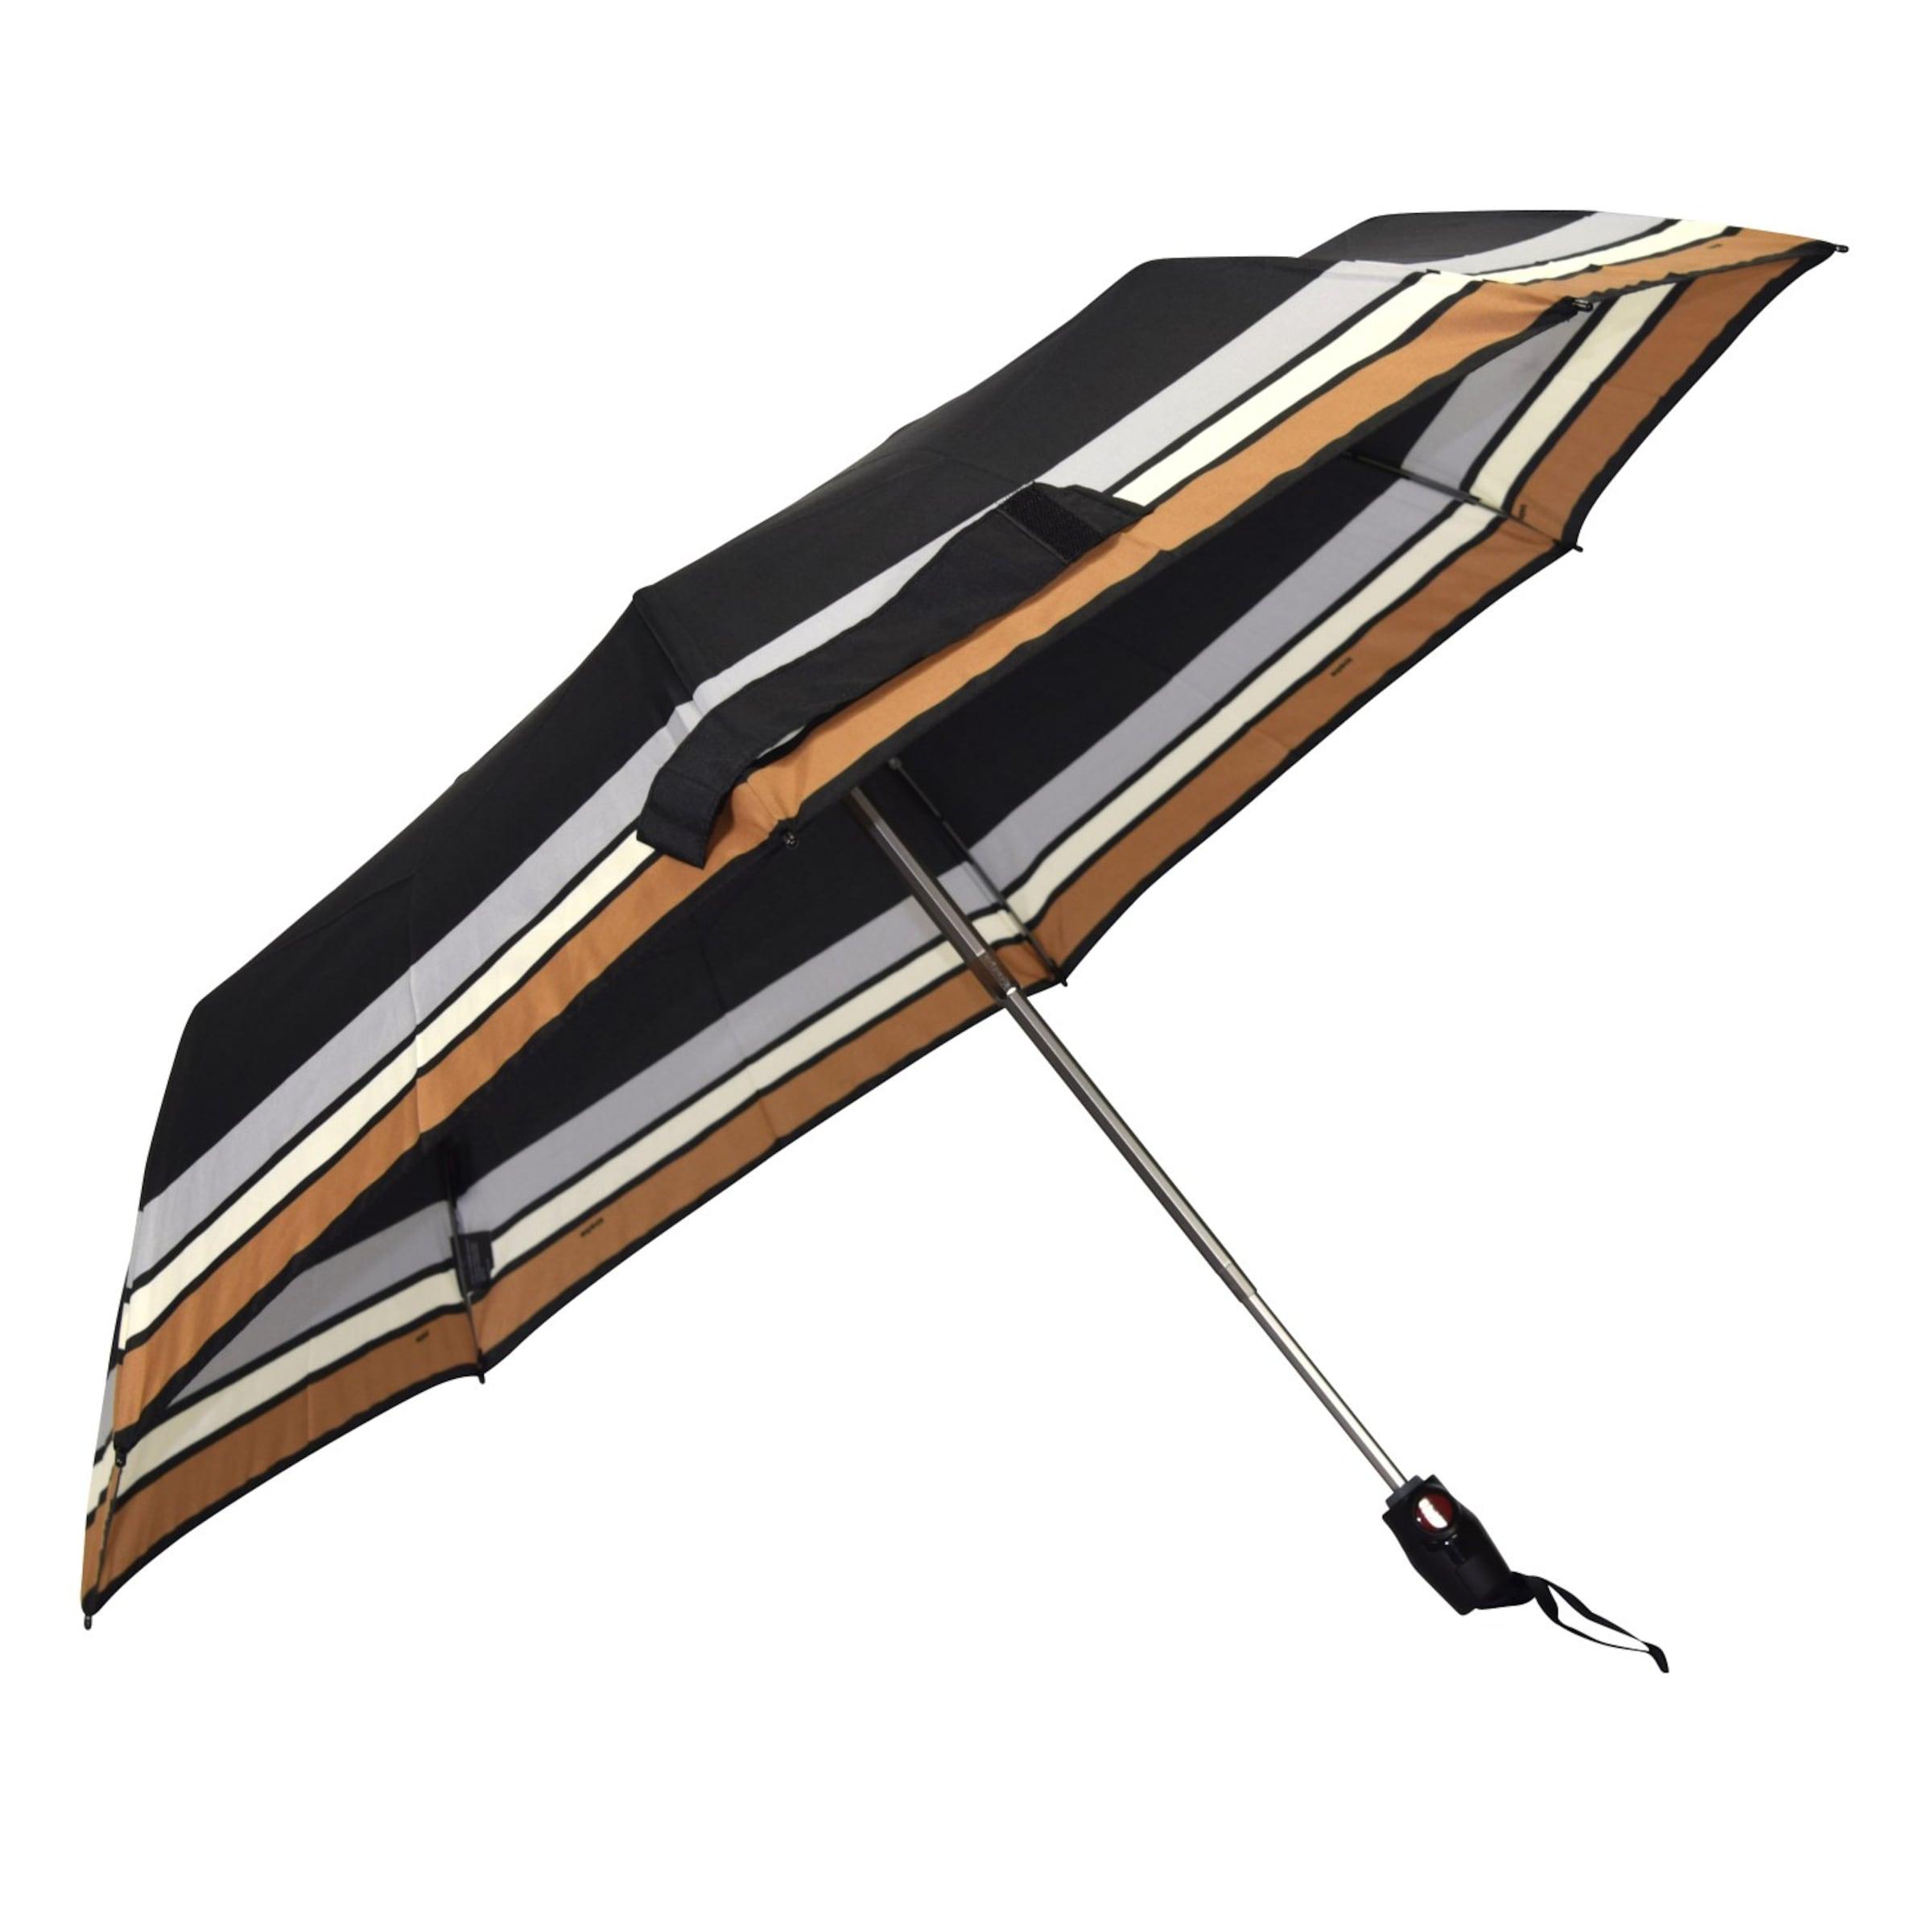 Parapluie Knirps Knirps Knirps Parapluie NoisetteNoir Parapluie En Parapluie En Knirps NoisetteNoir En En NoisetteNoir WedBorCx